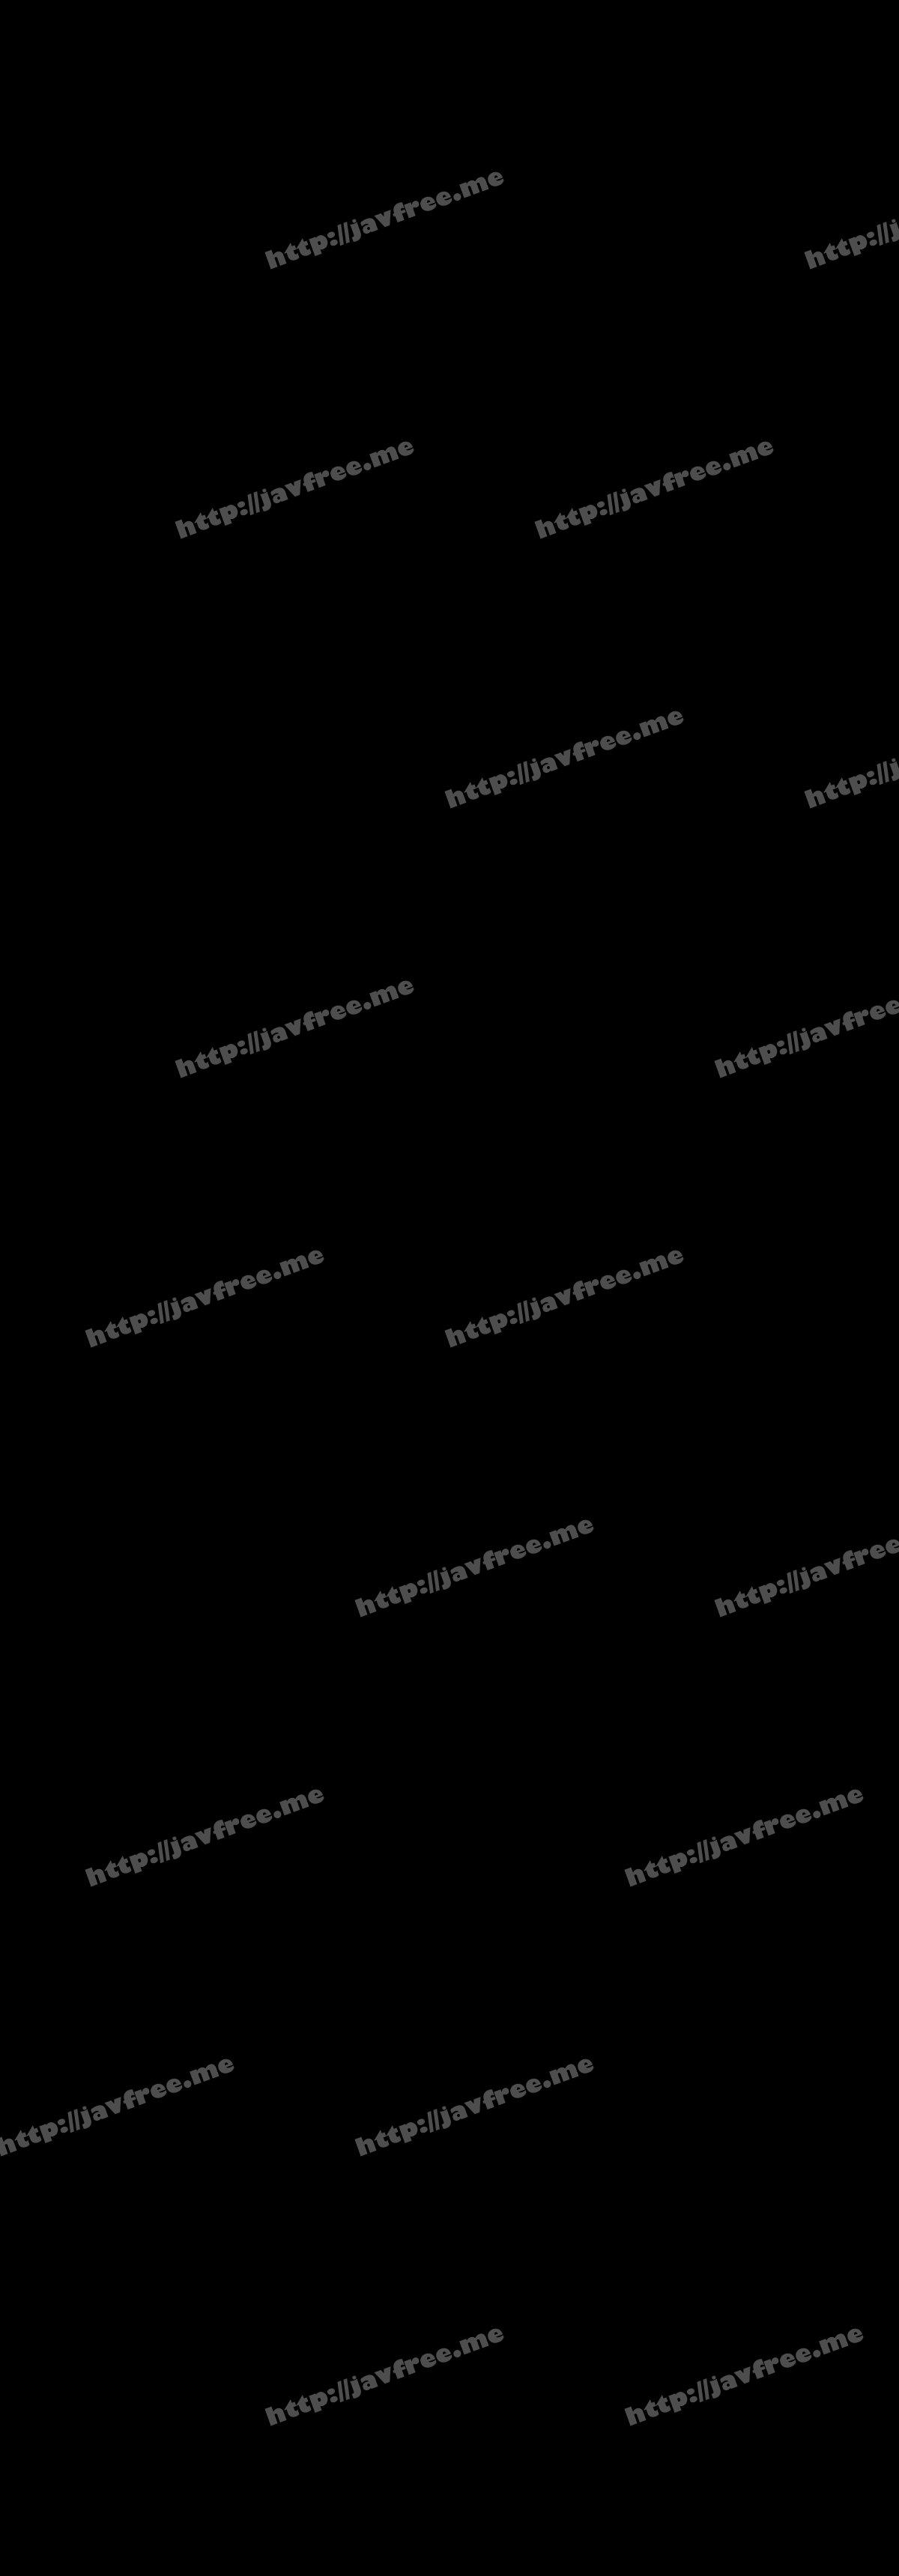 [HD][AVSA-088] 美しい部下の彼女 寿退職目前の豊満な女体 推川ゆうり - image AVSA-088-1080p on https://javfree.me